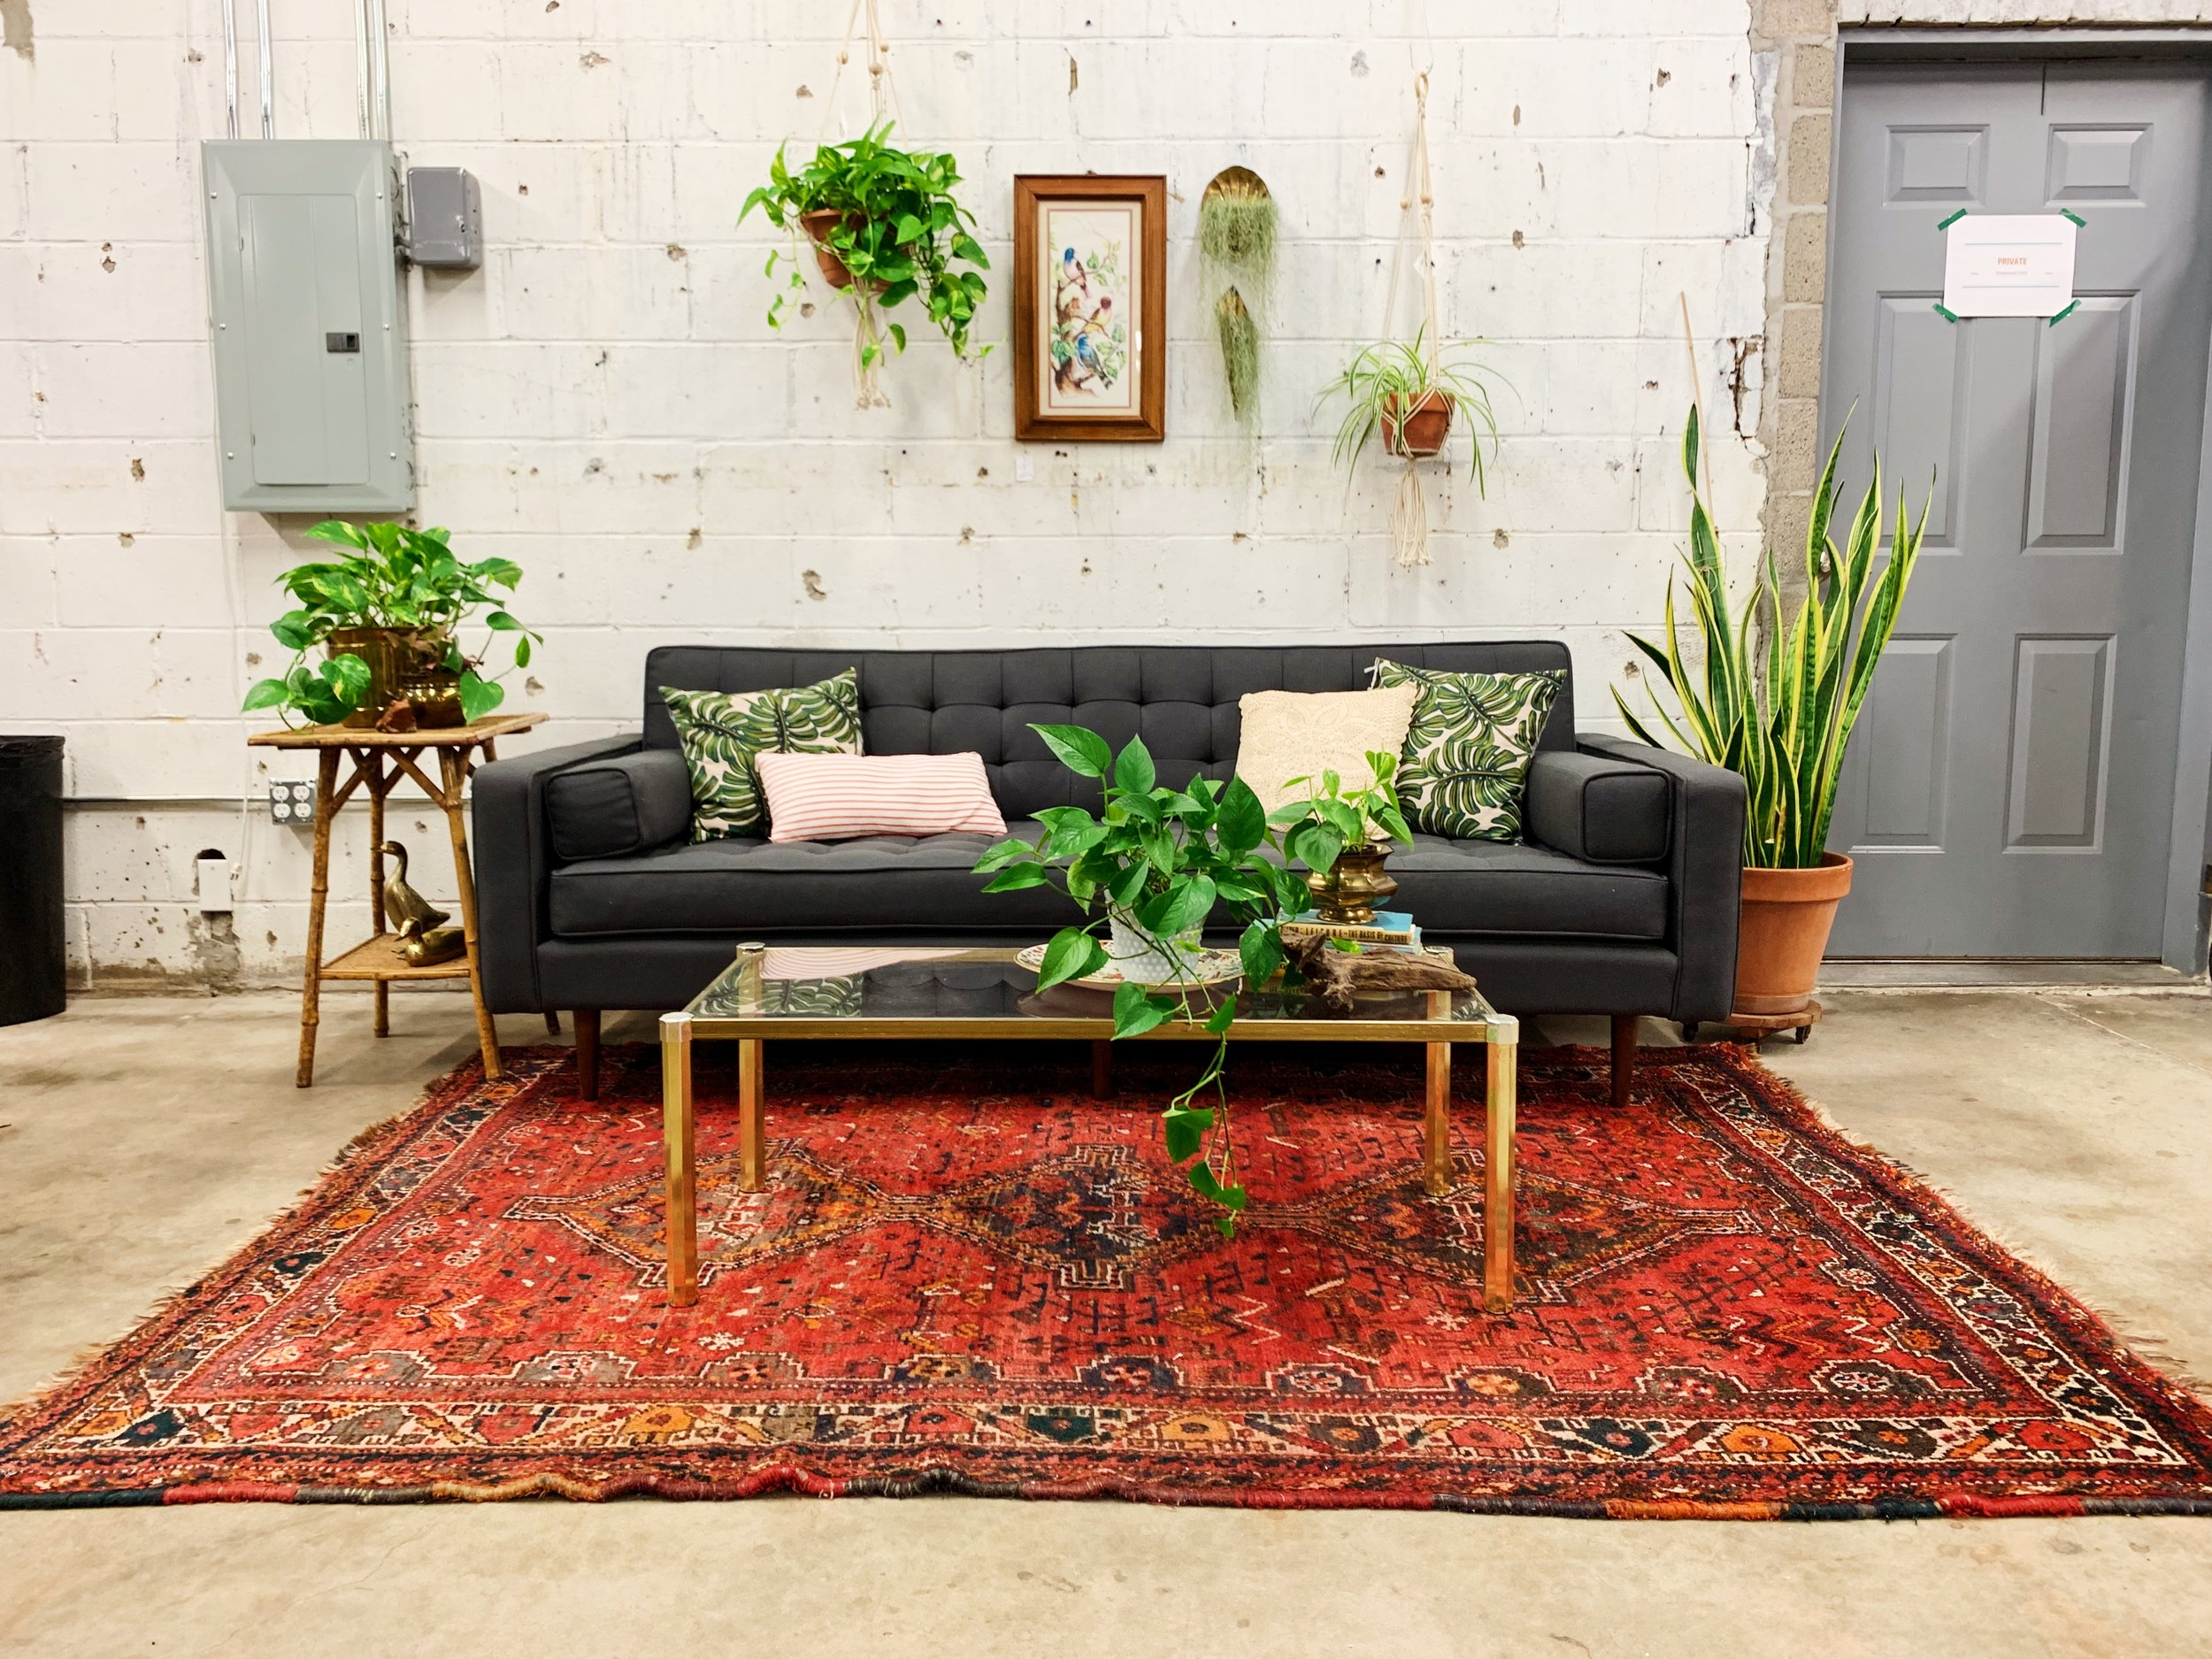 Tulsa Oklahoma Gus Modern Plant Lady Style Houseplants Living Room Furniture Decor